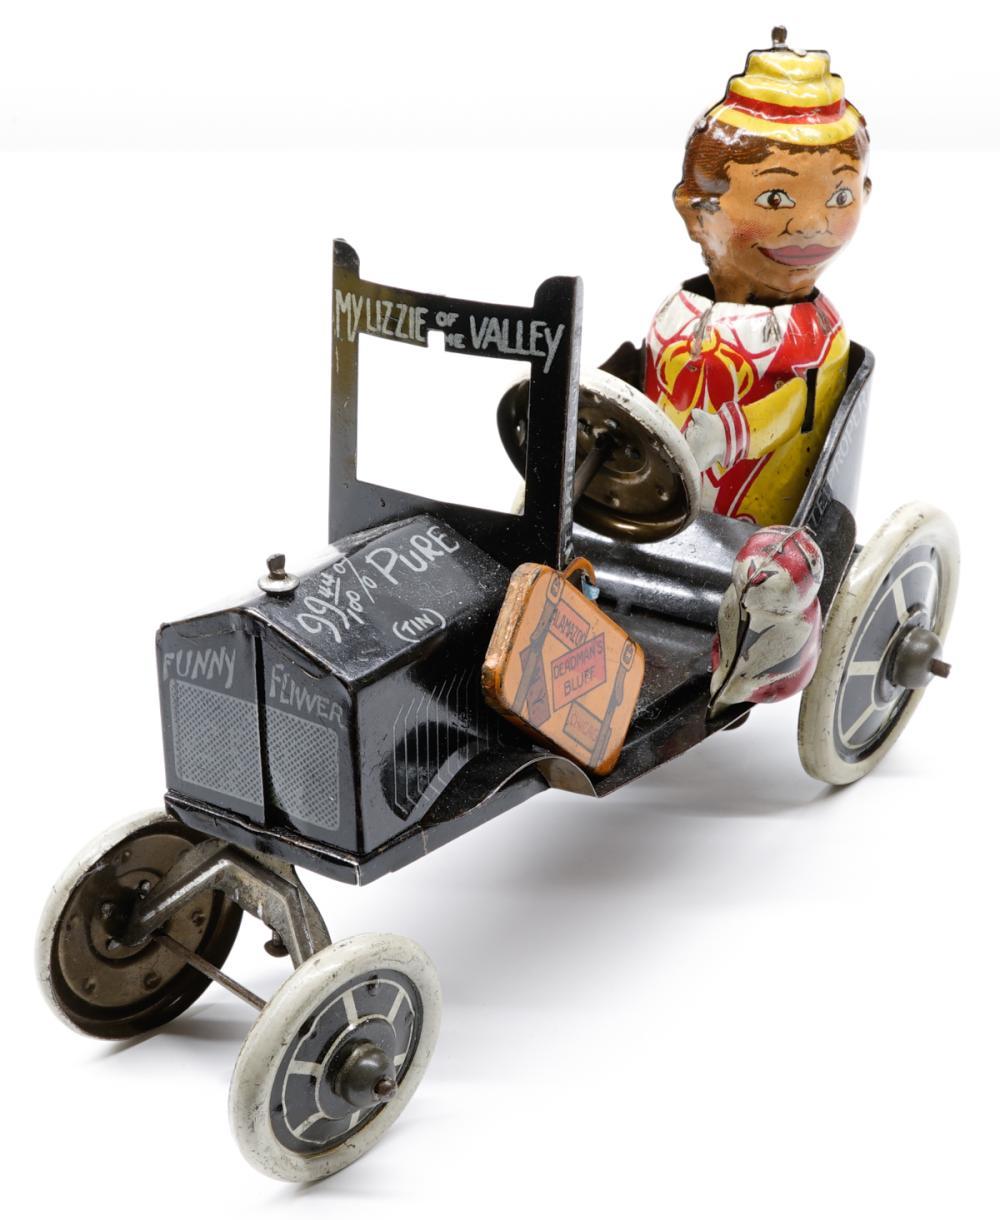 Marx Funny Fliver 4 Wheels No Breaks